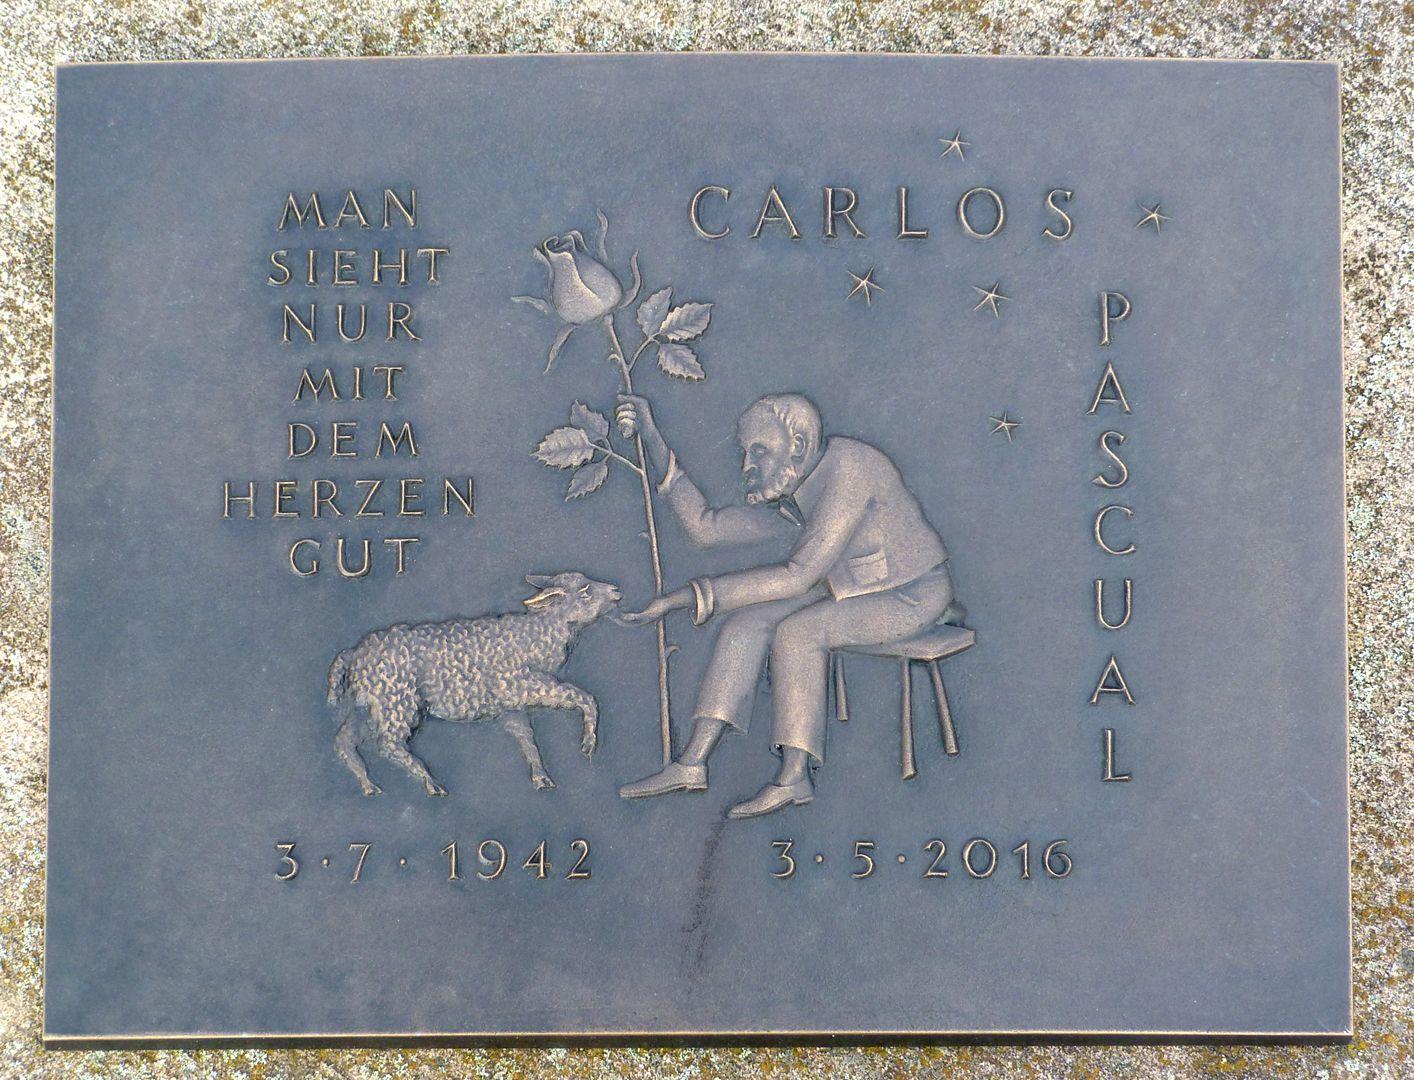 Carlos Pascual Grabstätte Epitaph mit Inschrift